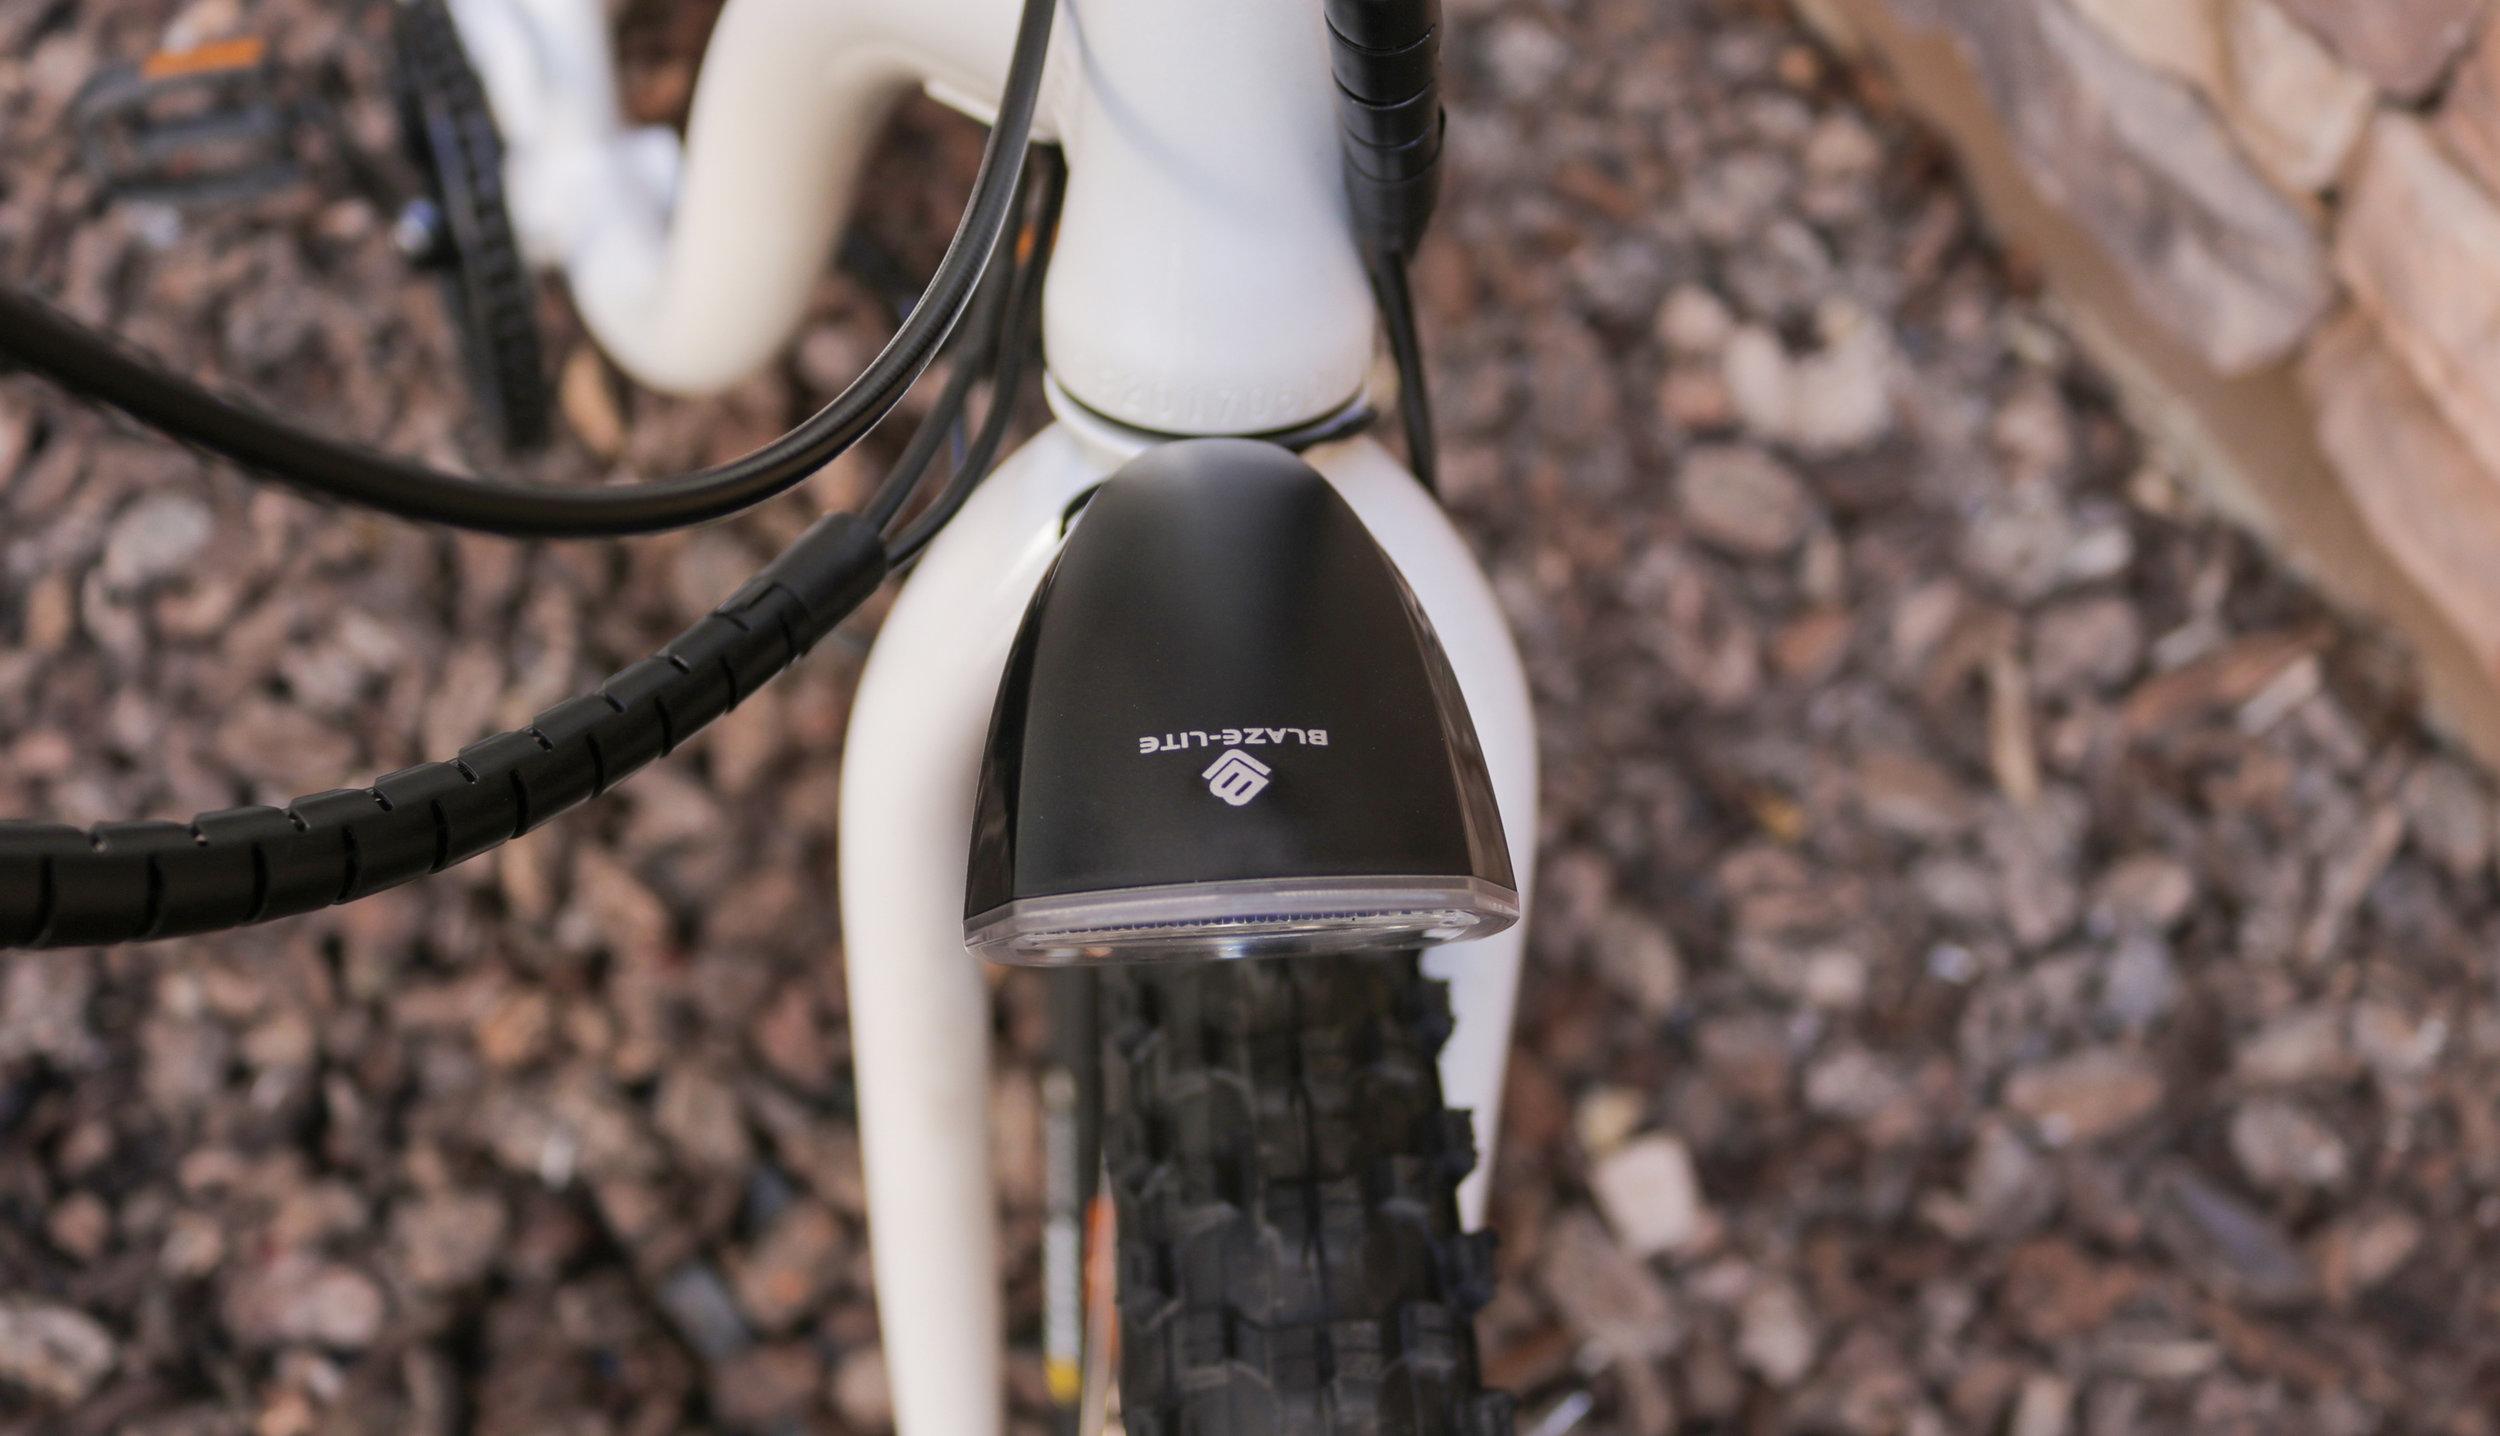 electrified-reviews-wave-electric-bike-review-headlight-2.jpg